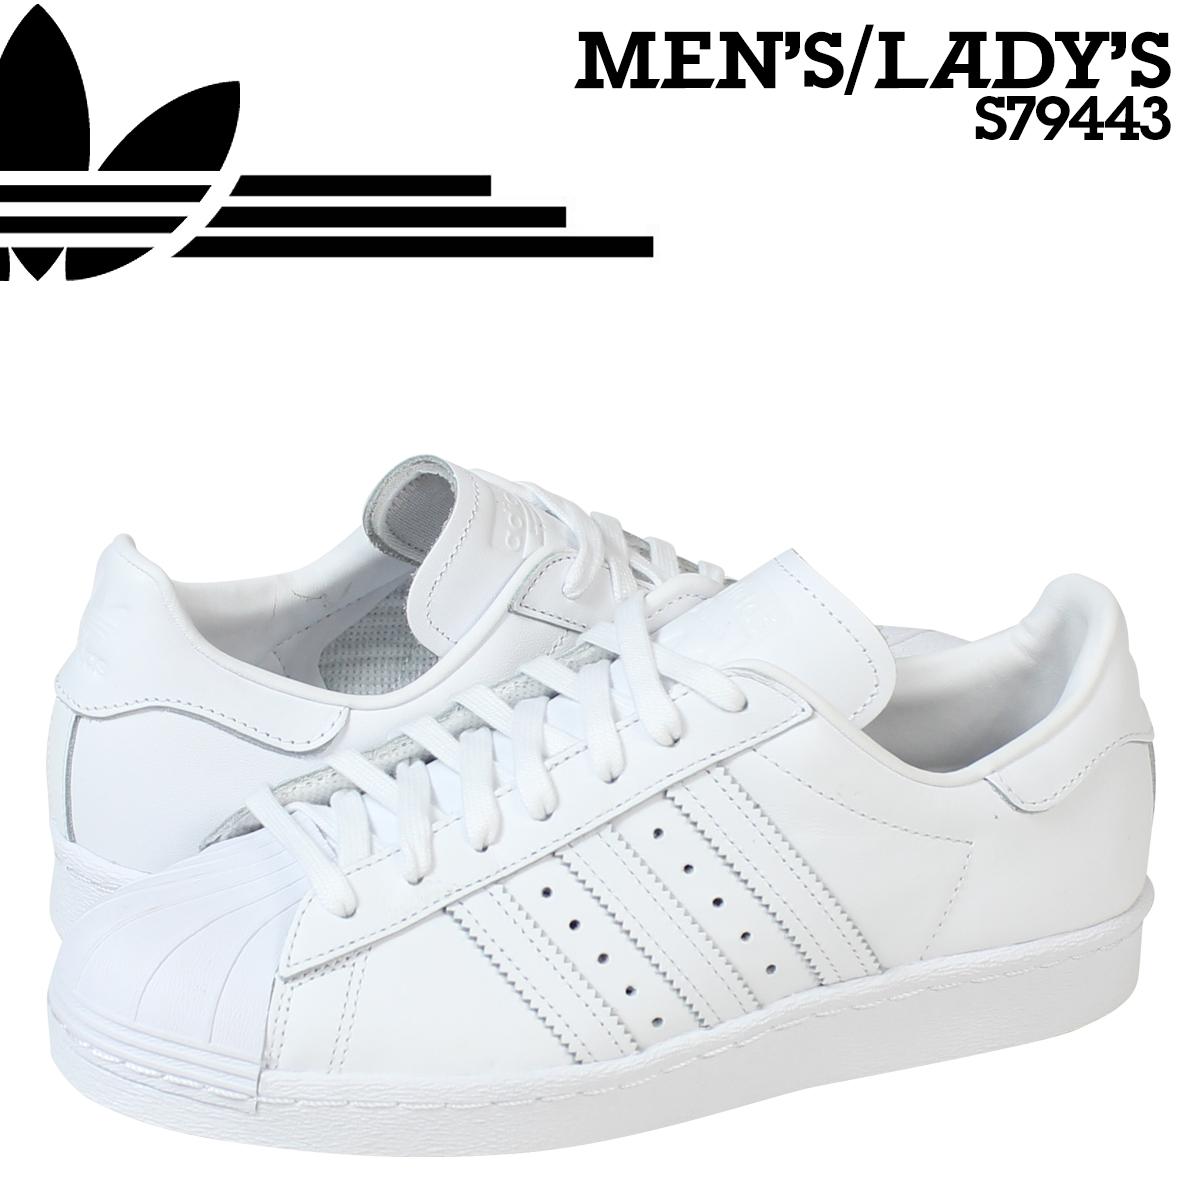 Adidas originals adidas Originals superstar sneakers SUPERSTAR 80 s S79443 men's women's shoes white